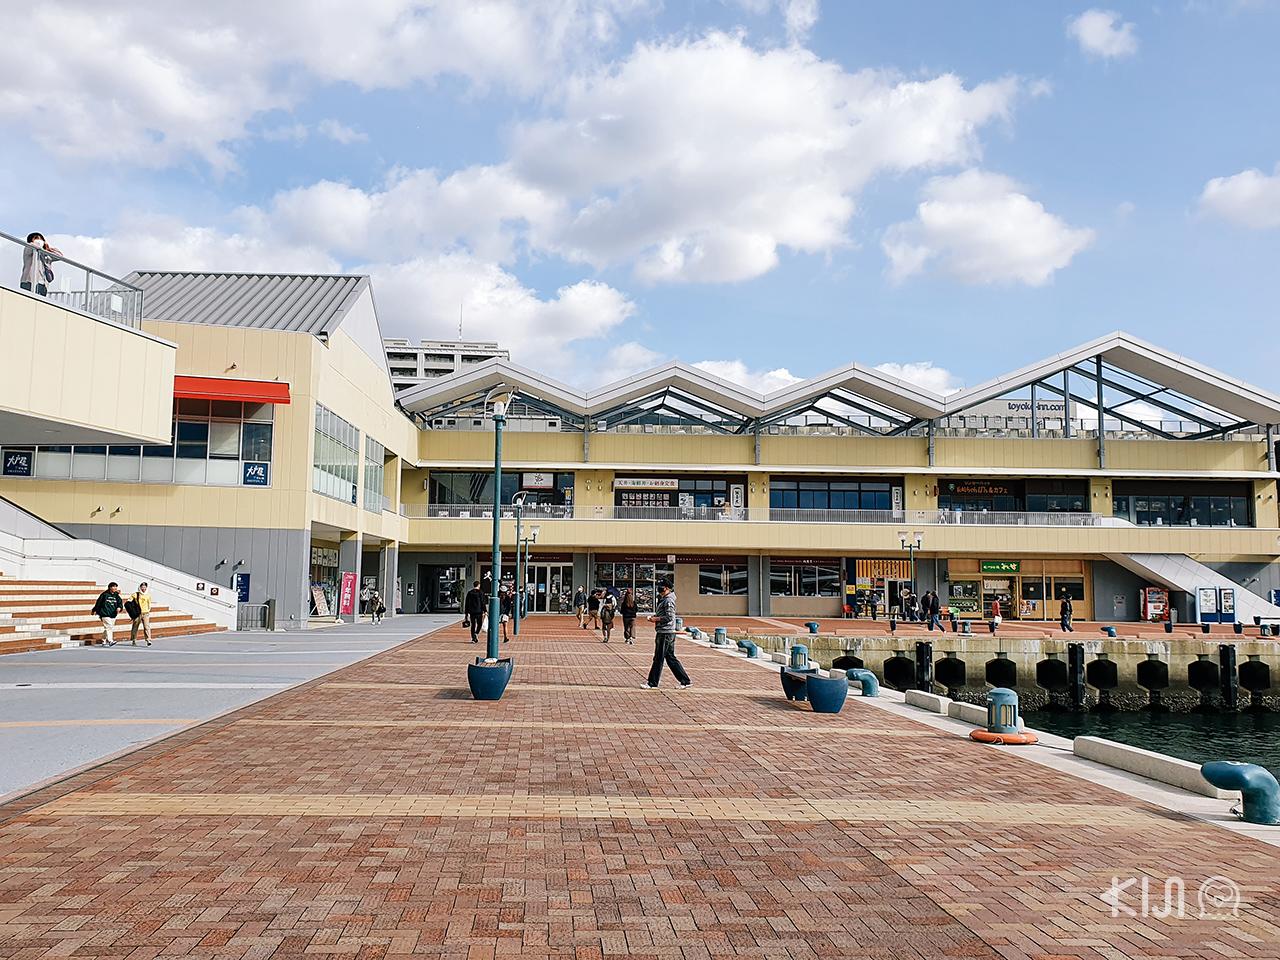 Saruku City 403 Arcade ในเมืองซาเซโบะ จ.นางาซากิ